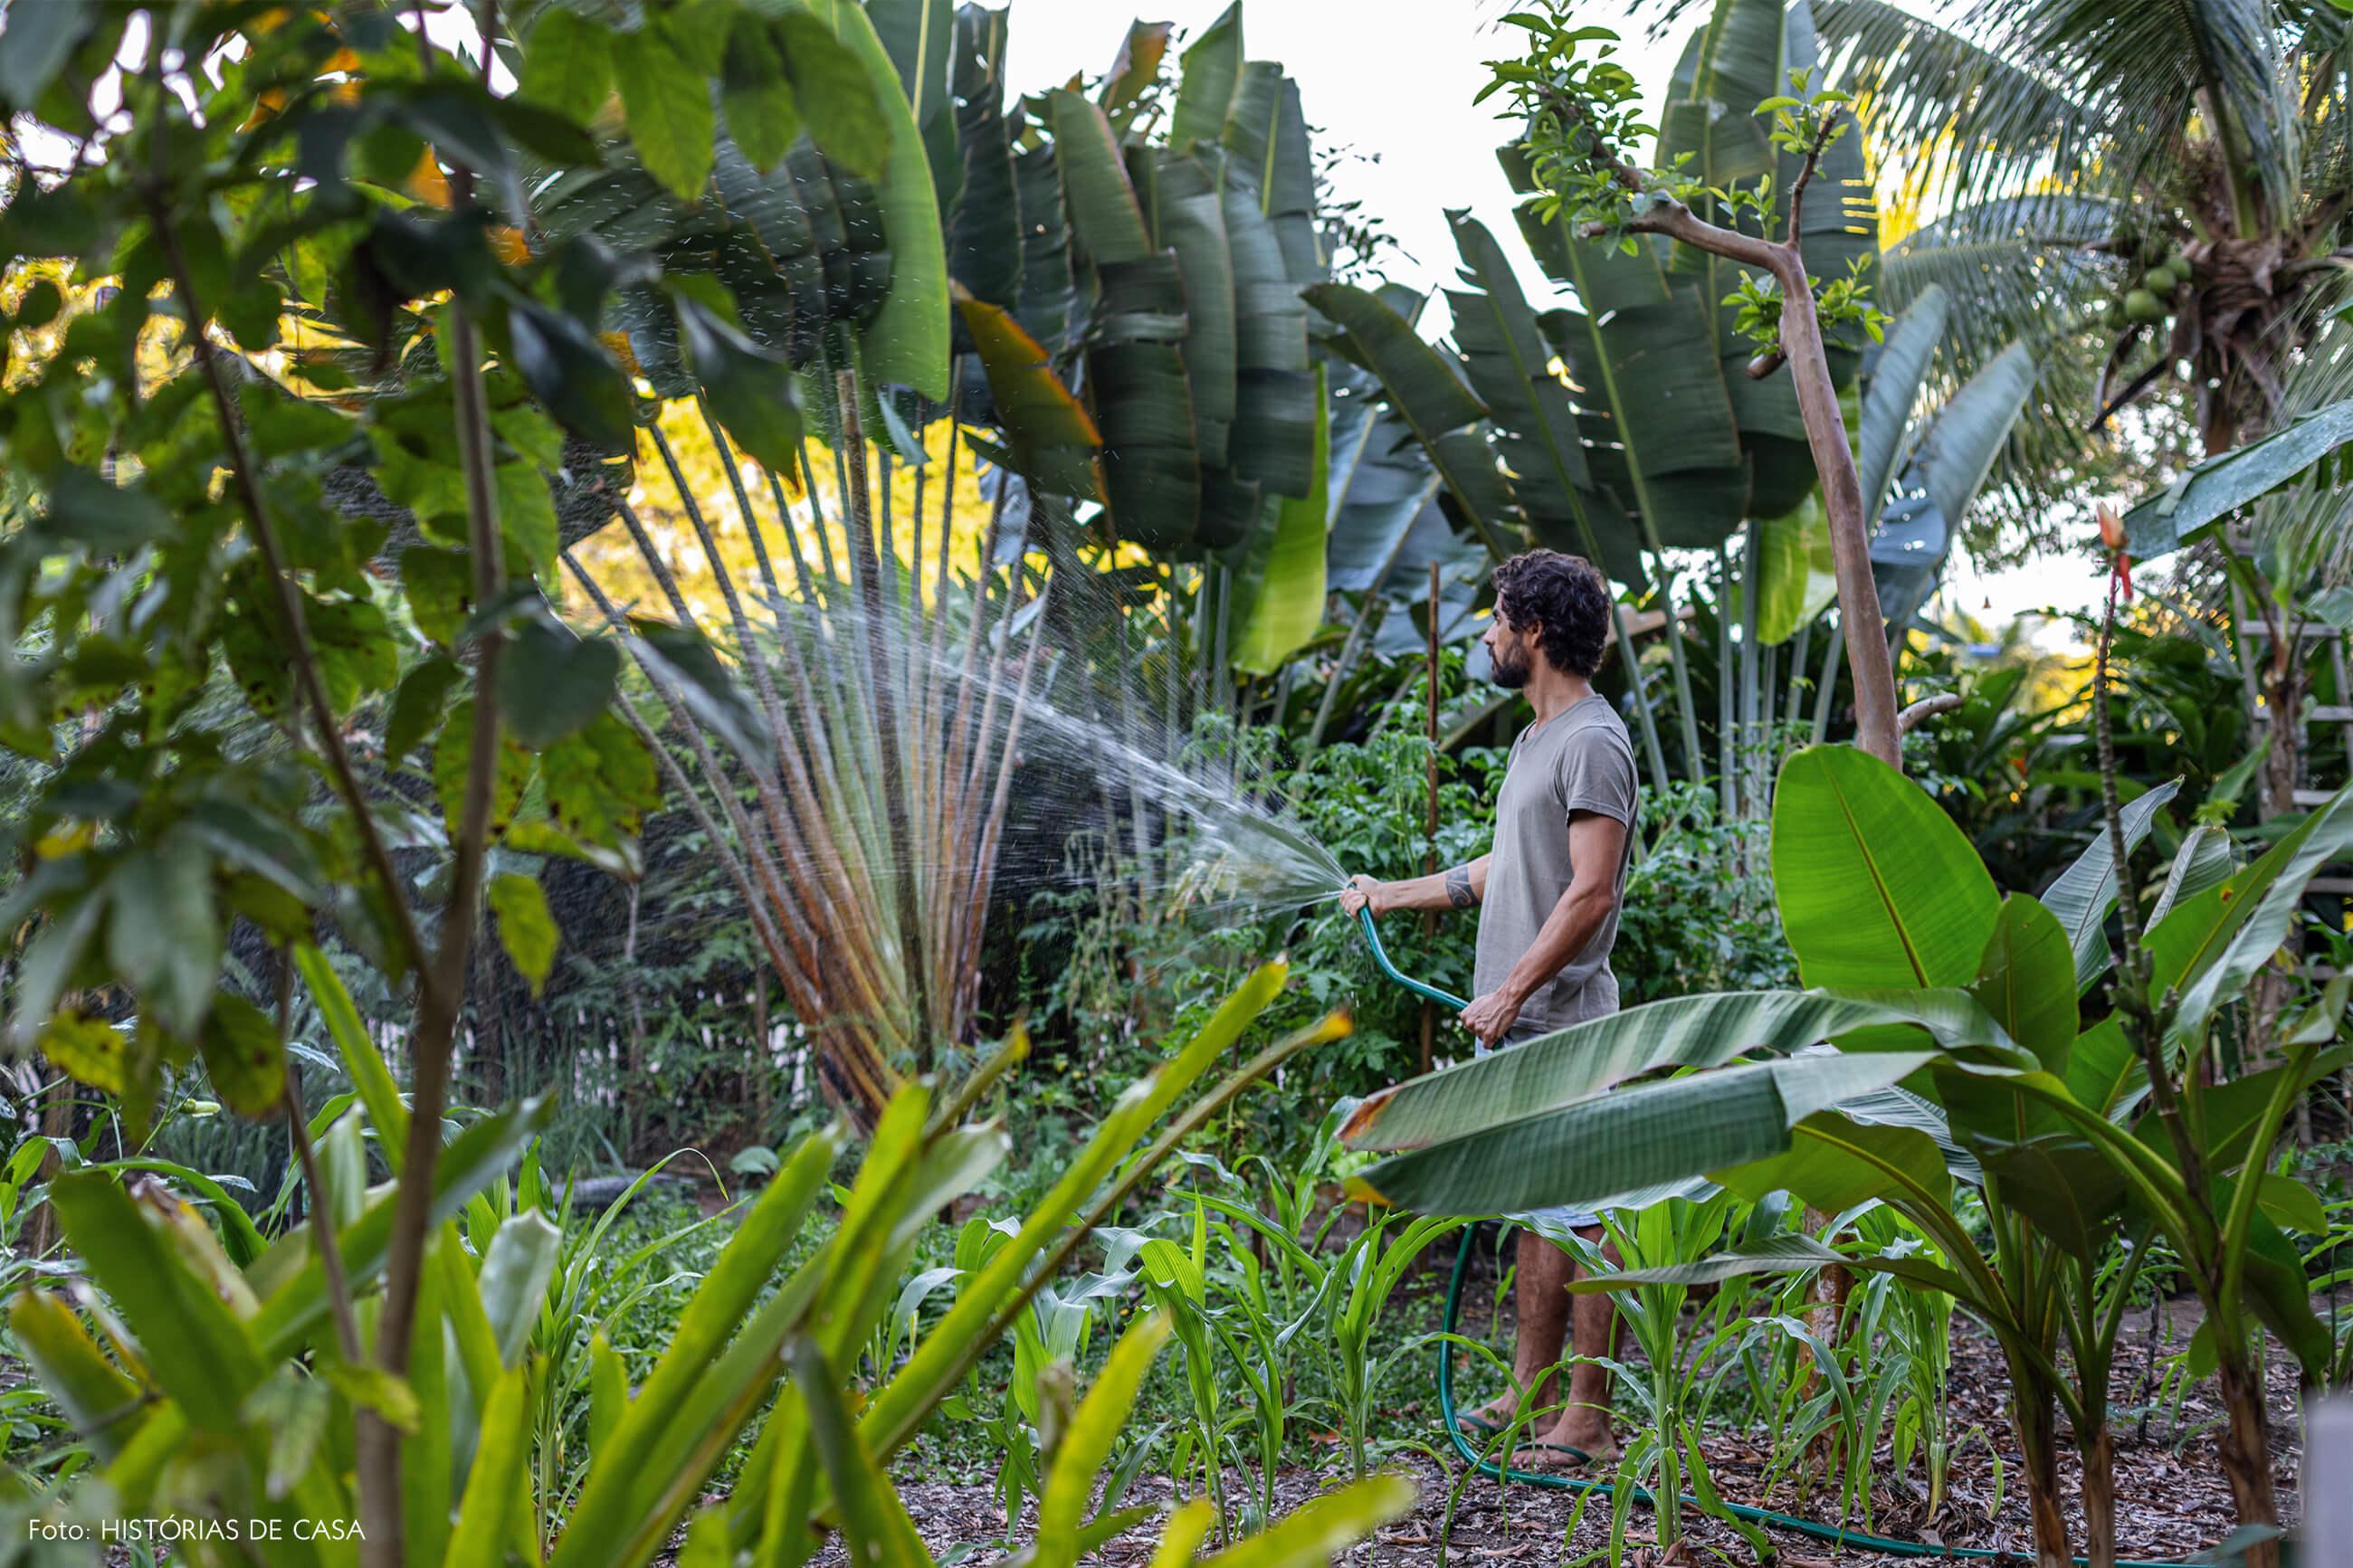 trancoso-decoracao-hotel-villase7e-76-retrato-jardim-plantas-mangueira